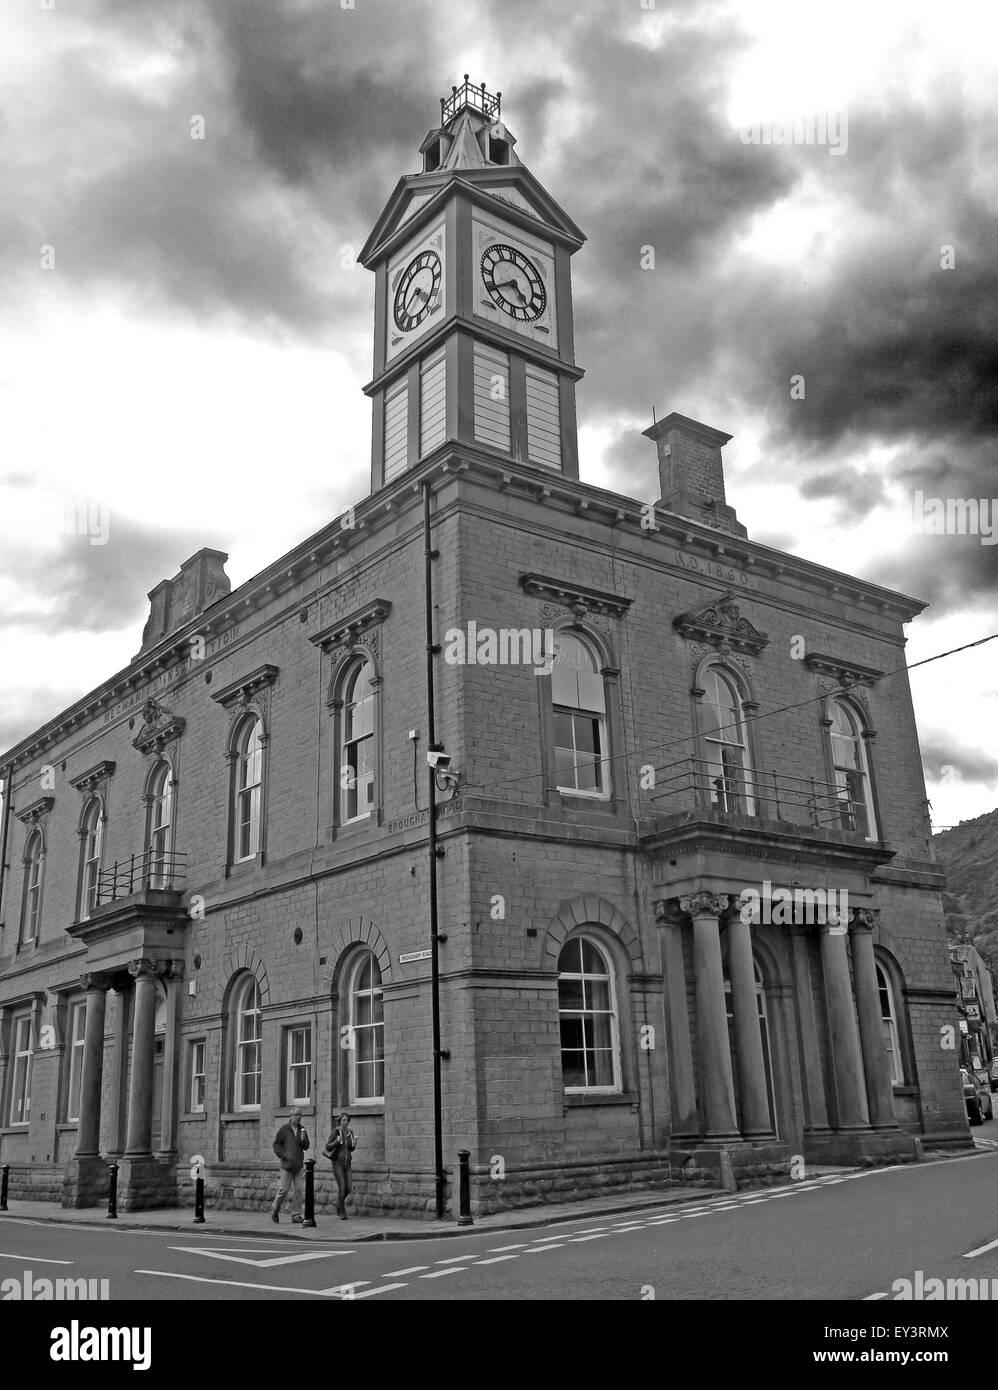 Institute,building,Kirklees,borough,Council,Aletrail,aletrain,England,UK,hall,Marsden Mechanics,West Yorkshire,GoTonySmith,Buy Pictures of,Buy Images Of